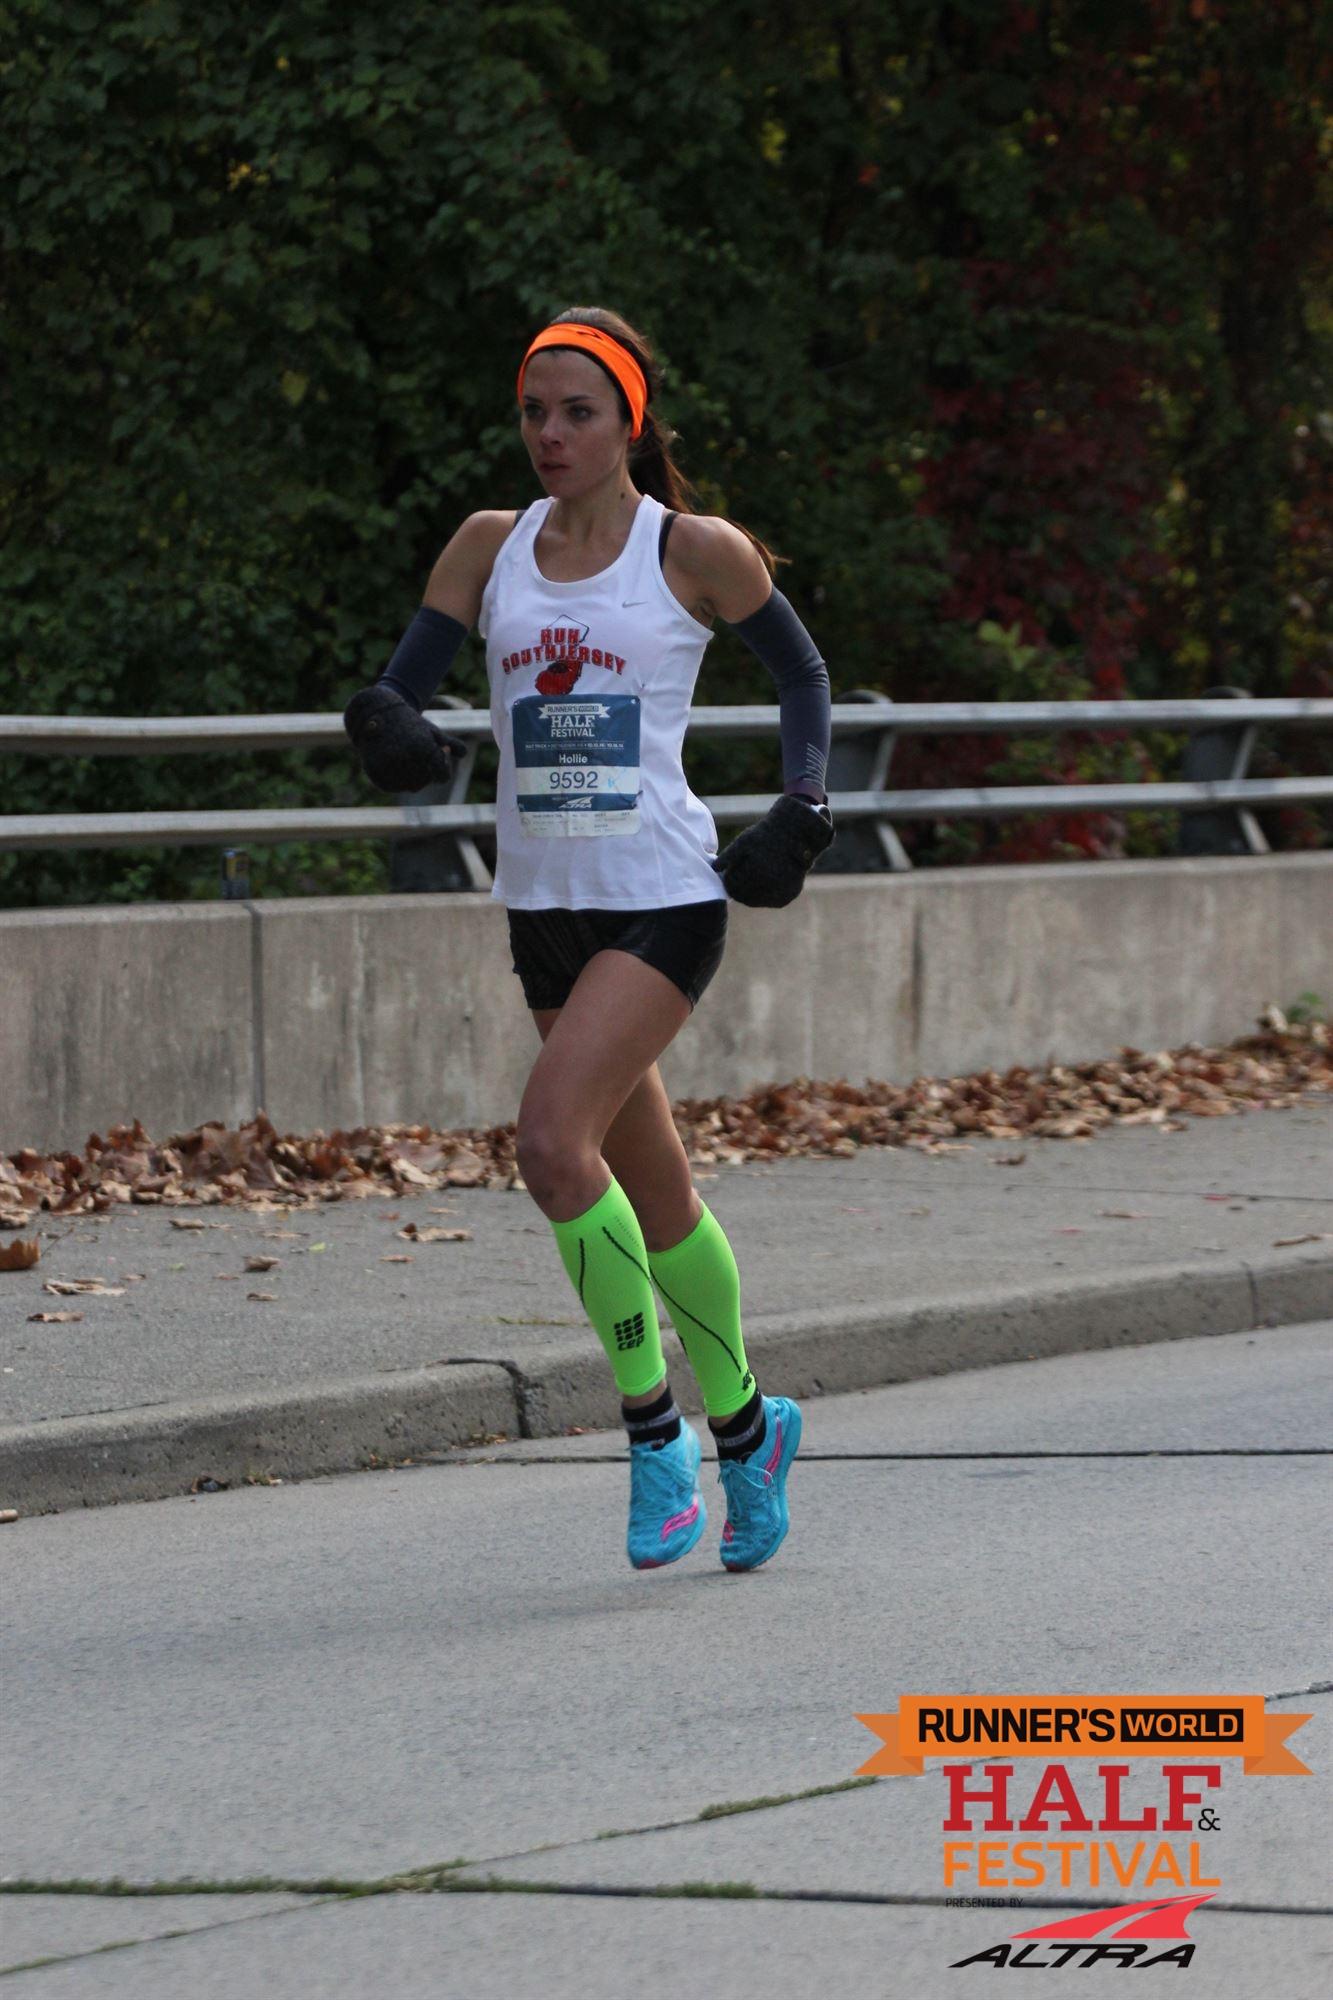 nike free run distance runners world half marathon